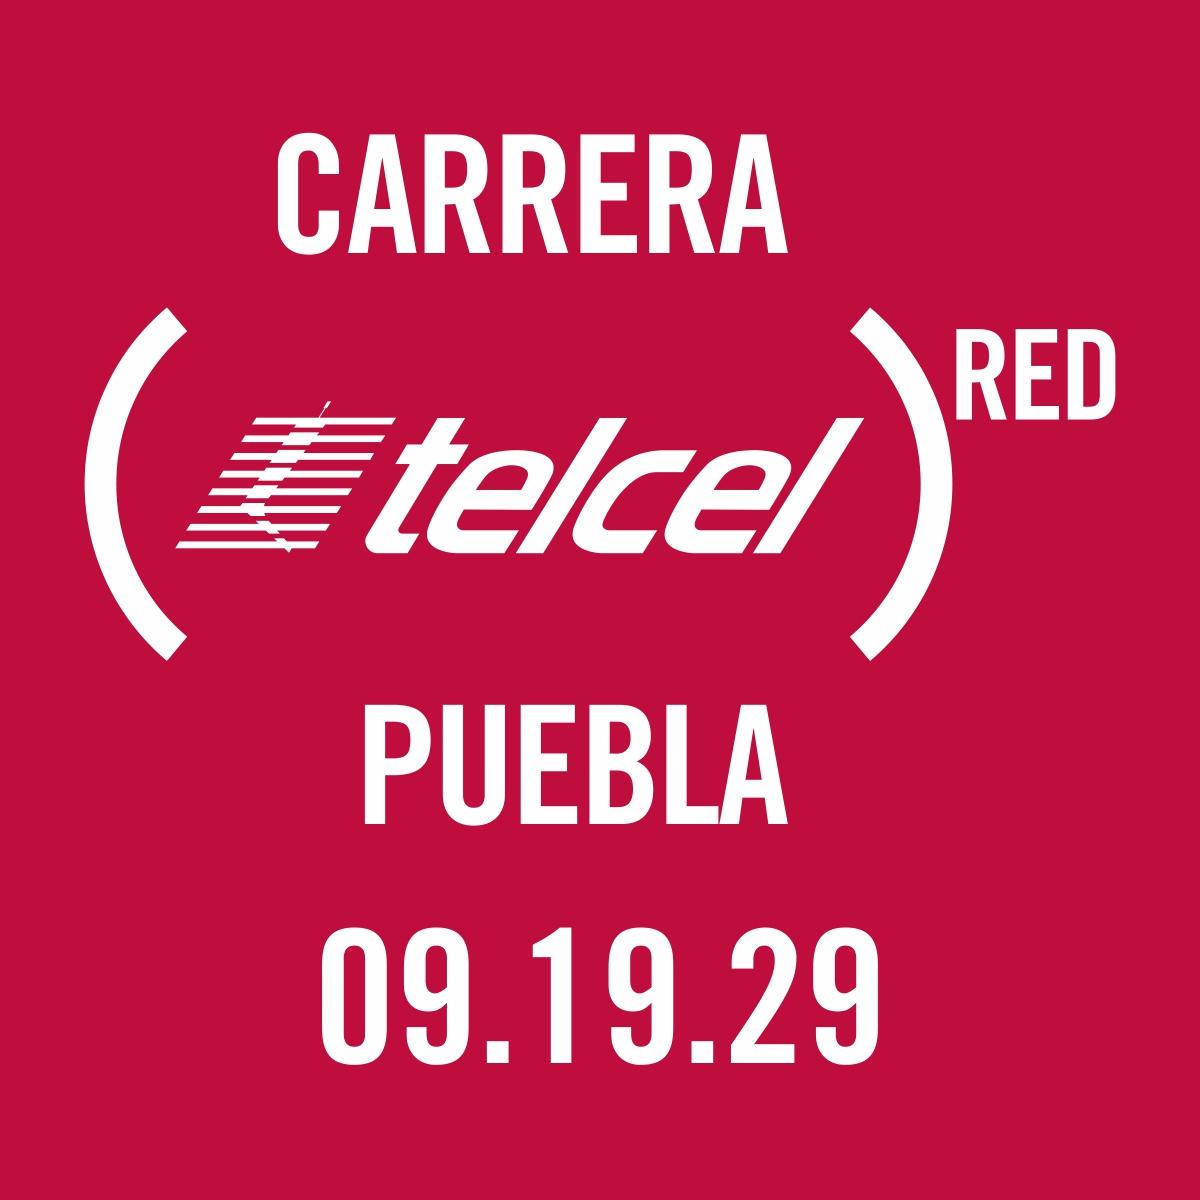 11a Carrera TELCEL RED Puebla 2019